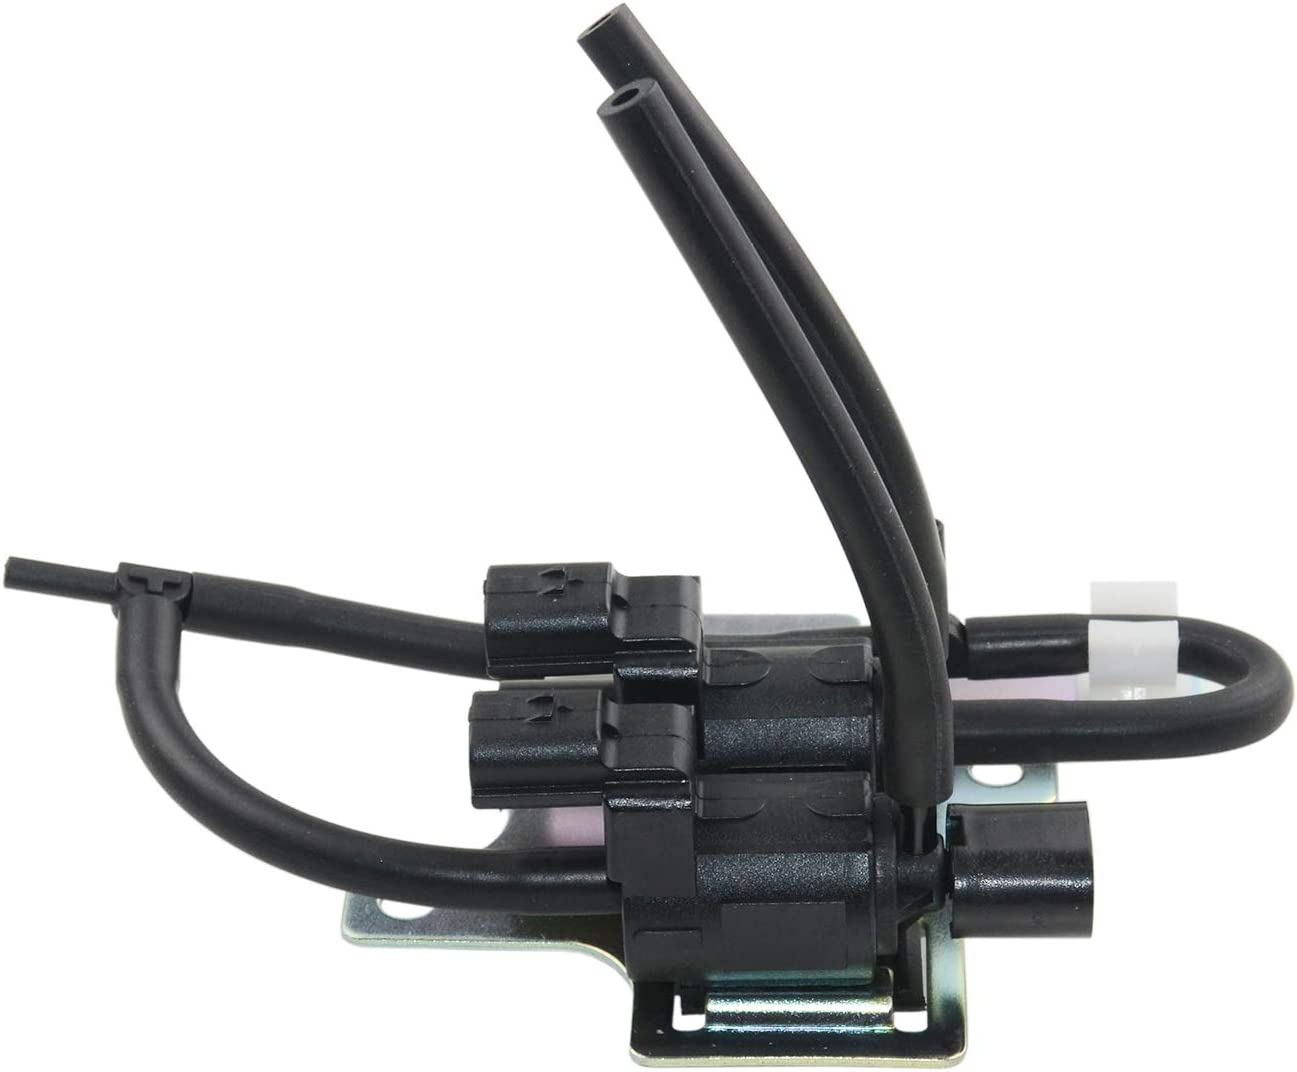 Clutch Control Vacuum Switch Solenoid Valve Replacement for Mitsubishi Pajero L200 L300 V43 V44 V45 K74T V73 V75 V78 Montero Xls Sport 1994-2007 8657A031 MB937731 MB620532 MR430381